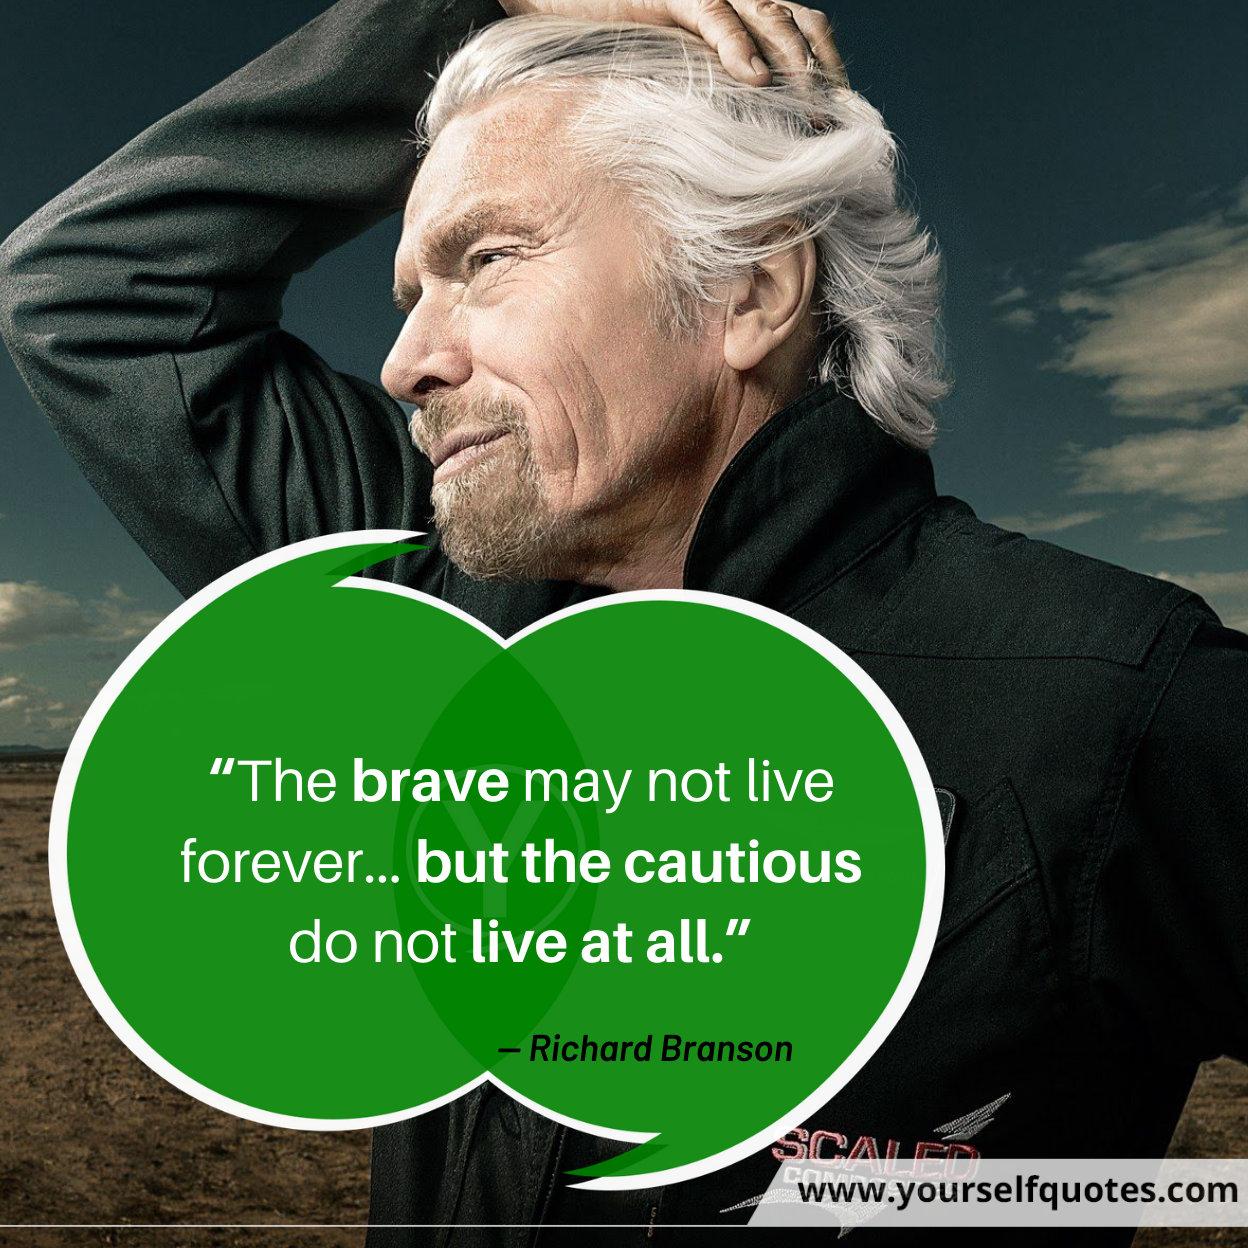 Richard Branson Quotes on Success